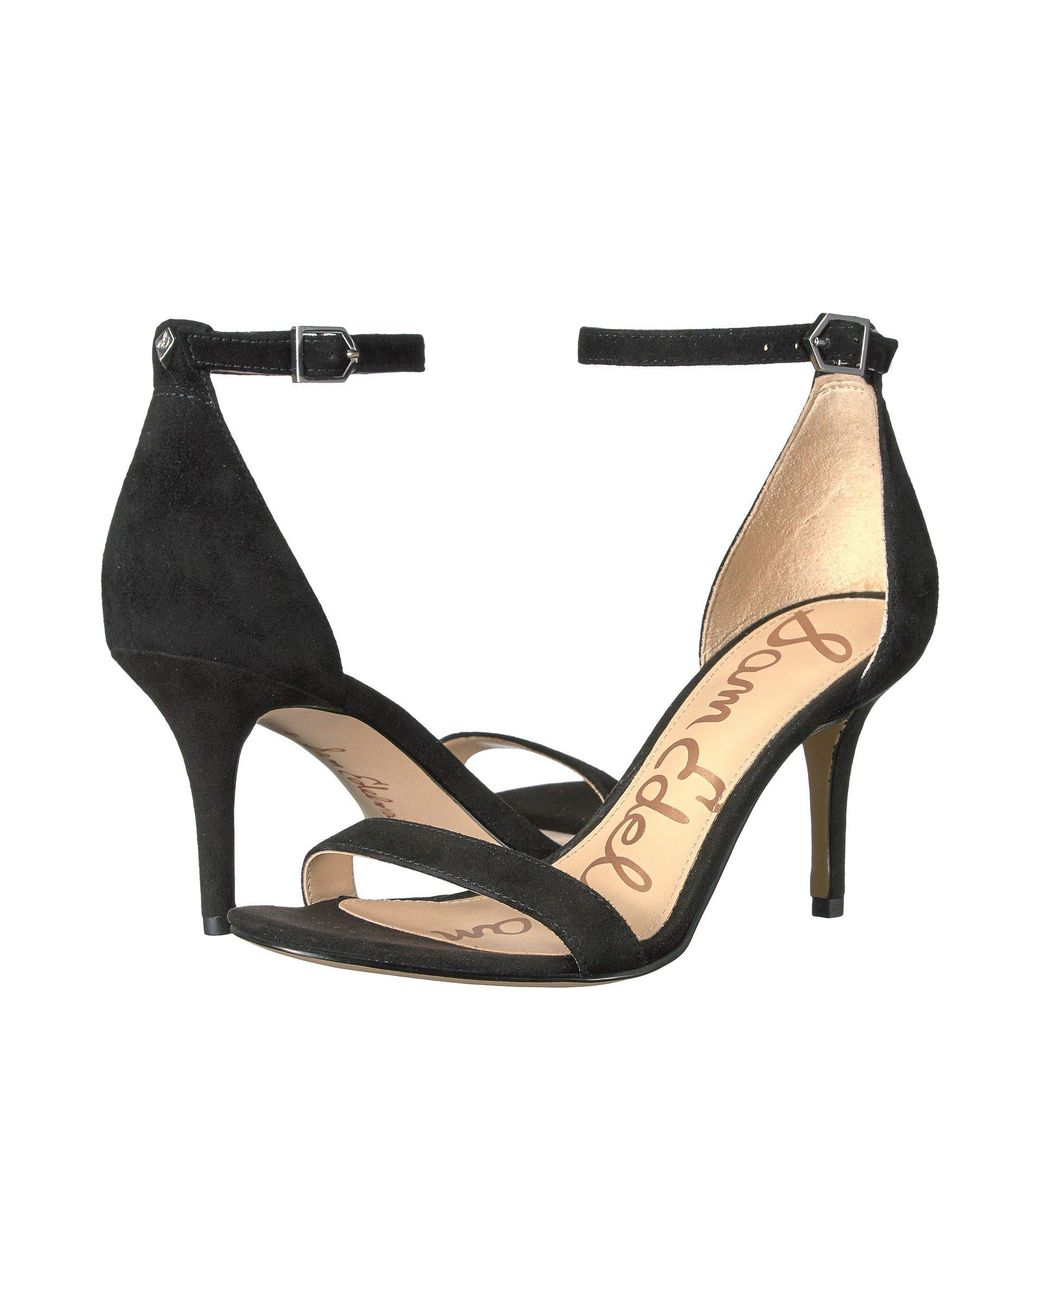 6401cfe3c Lyst - Sam Edelman Patti Dress Sandal in Black - Save 57%